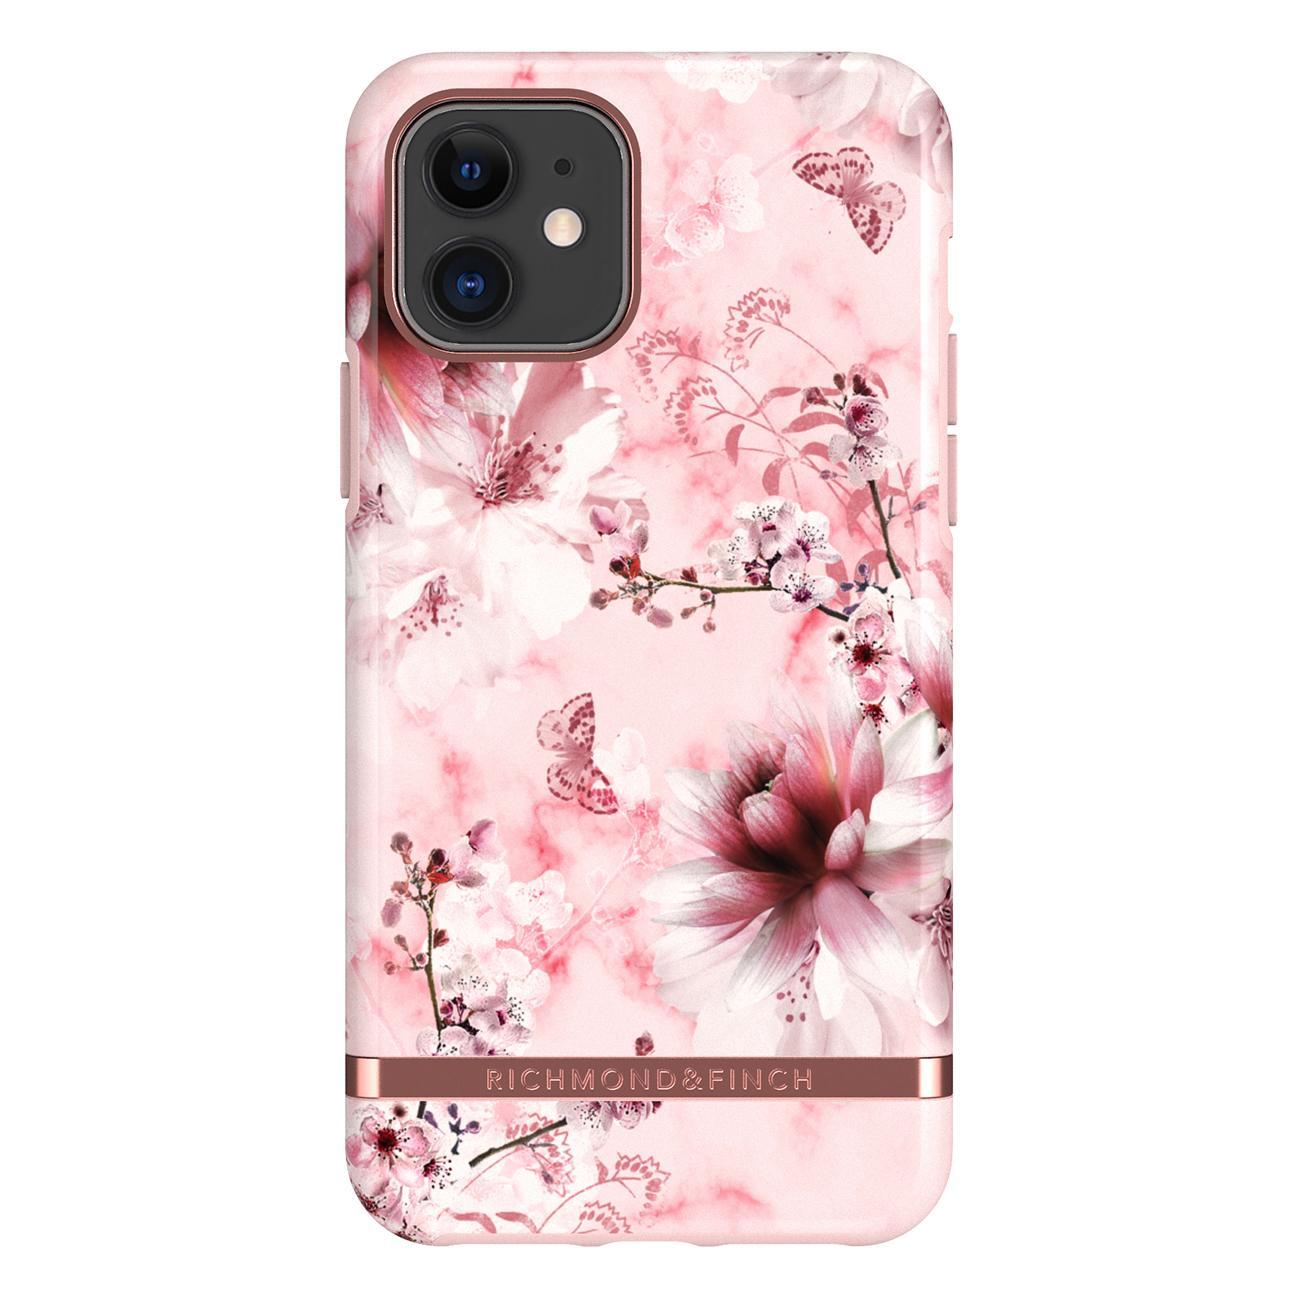 Skal iPhone 11 Pink Marble Floral